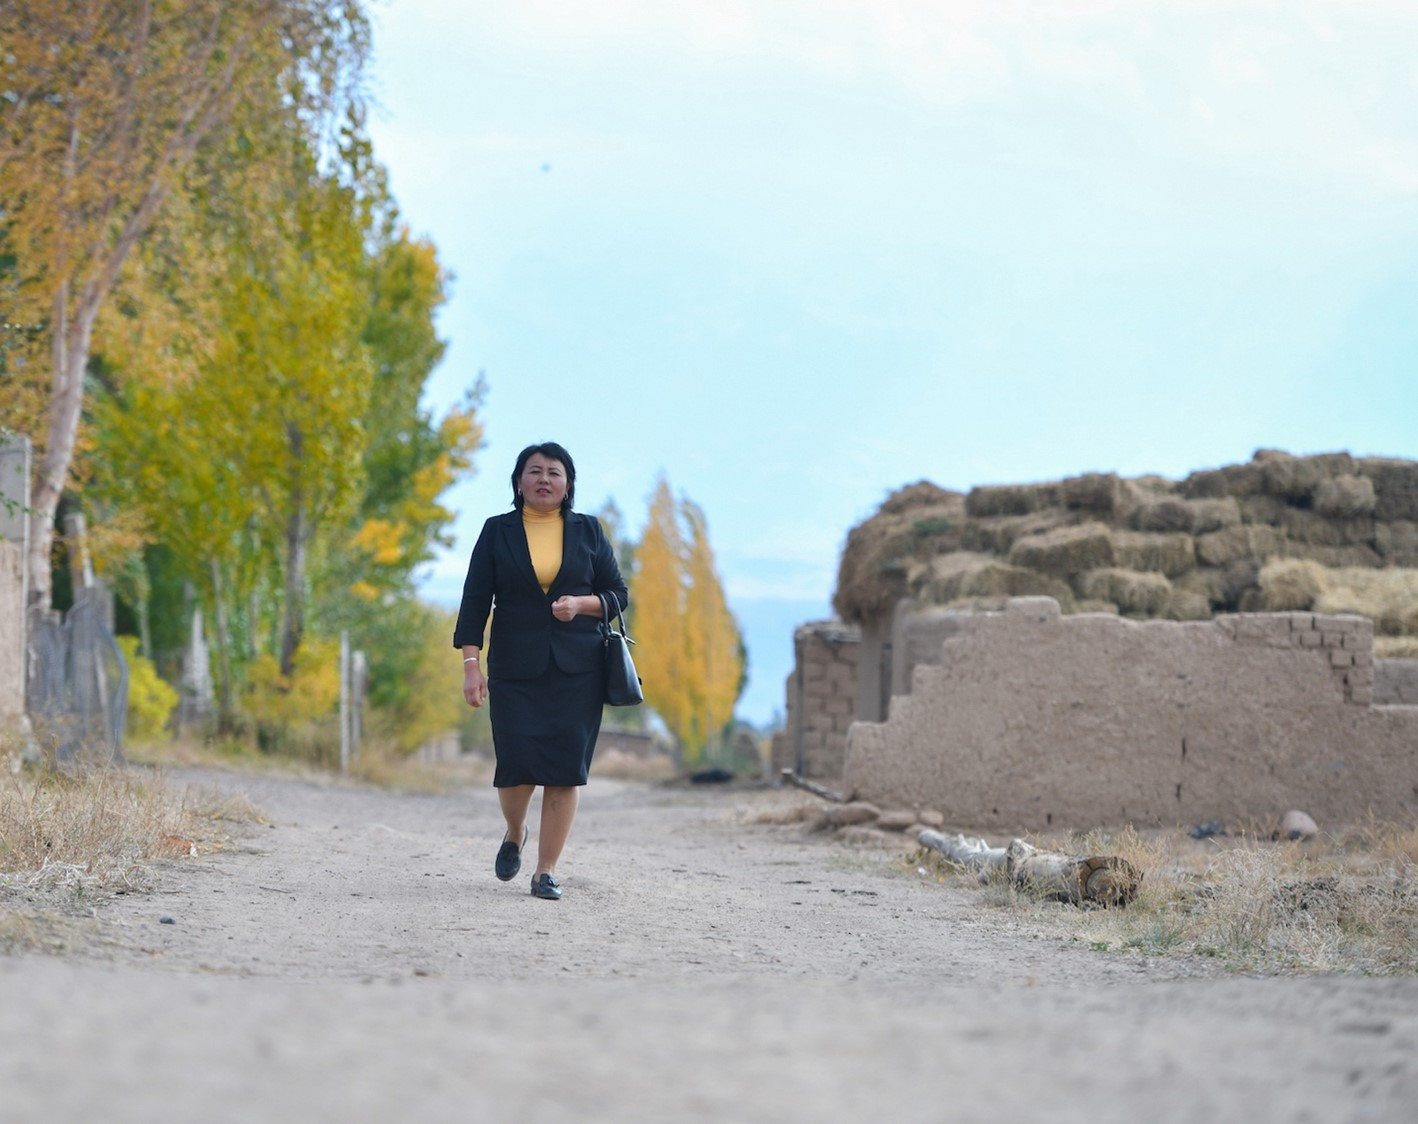 Mrs. Tursunai Akmatova's photo